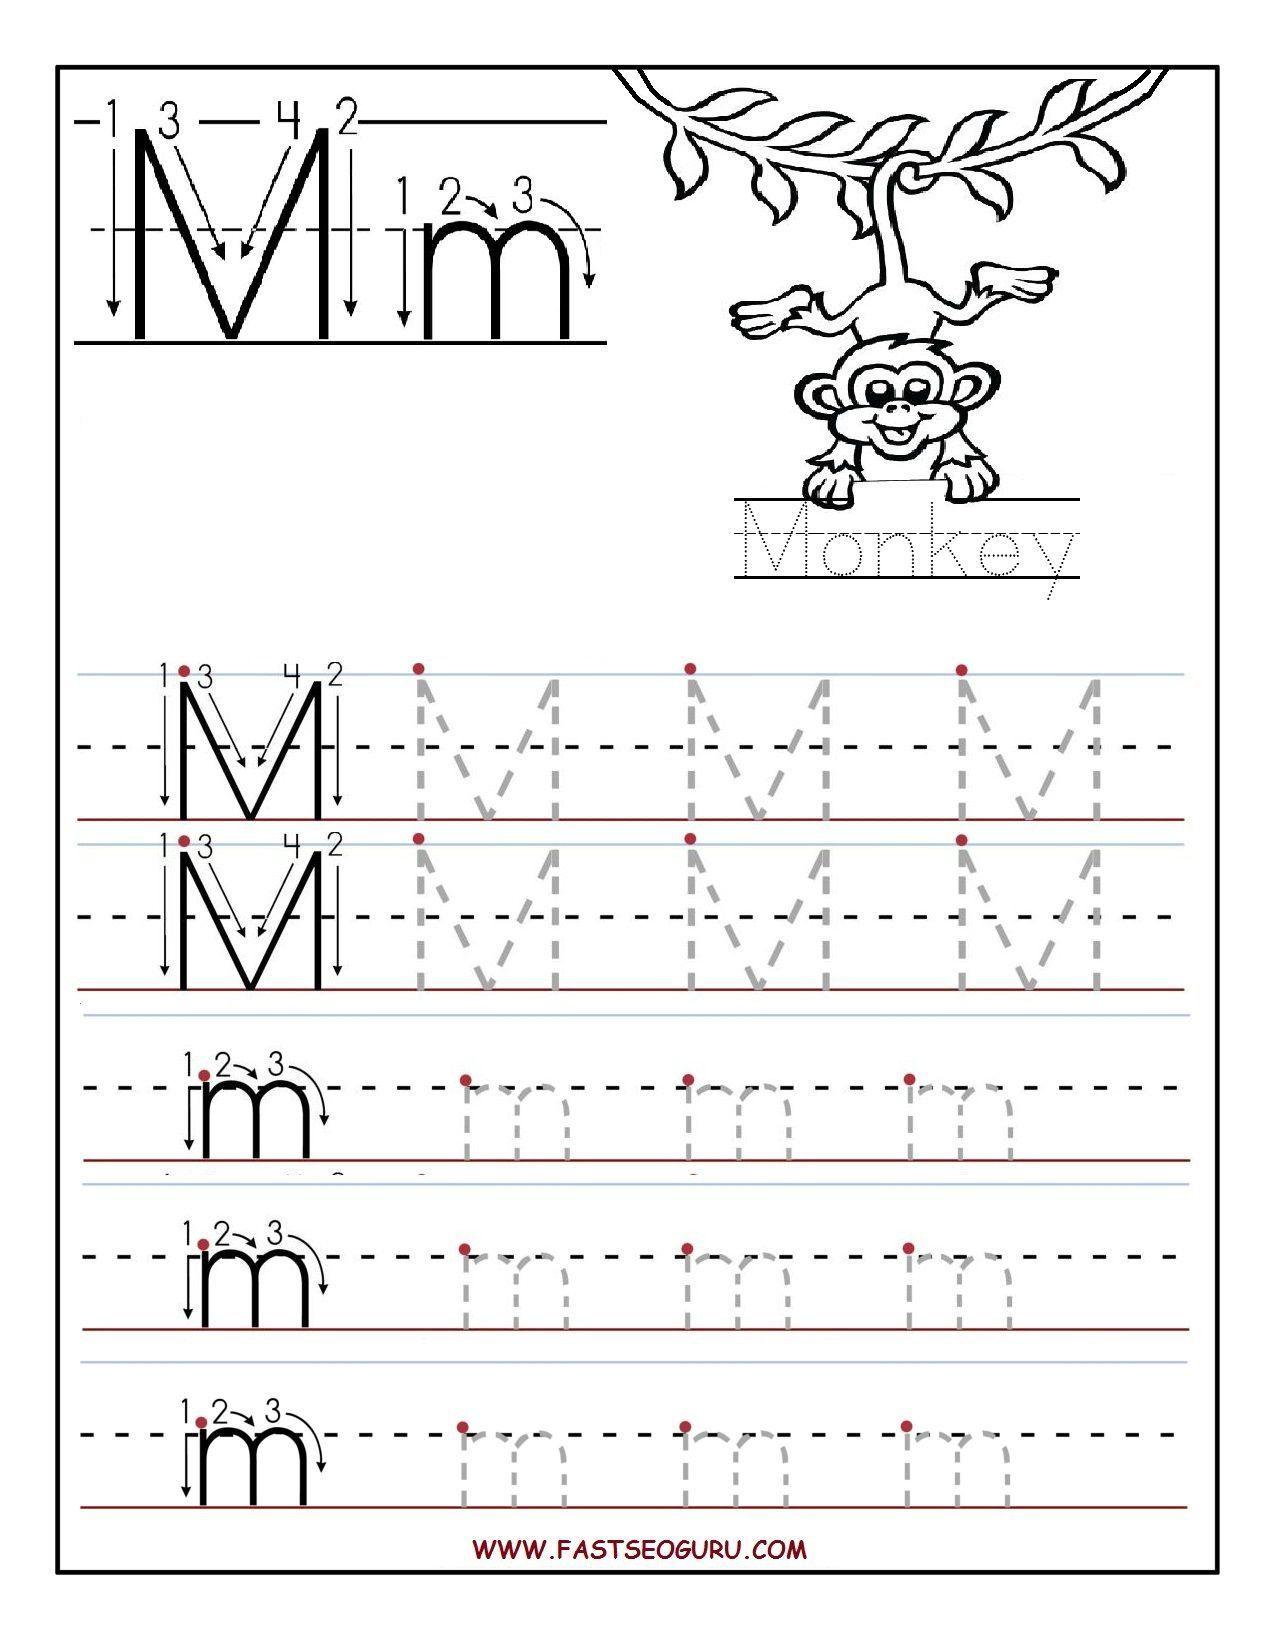 Printable Letter M Tracing Worksheets For Preschool Bobbi